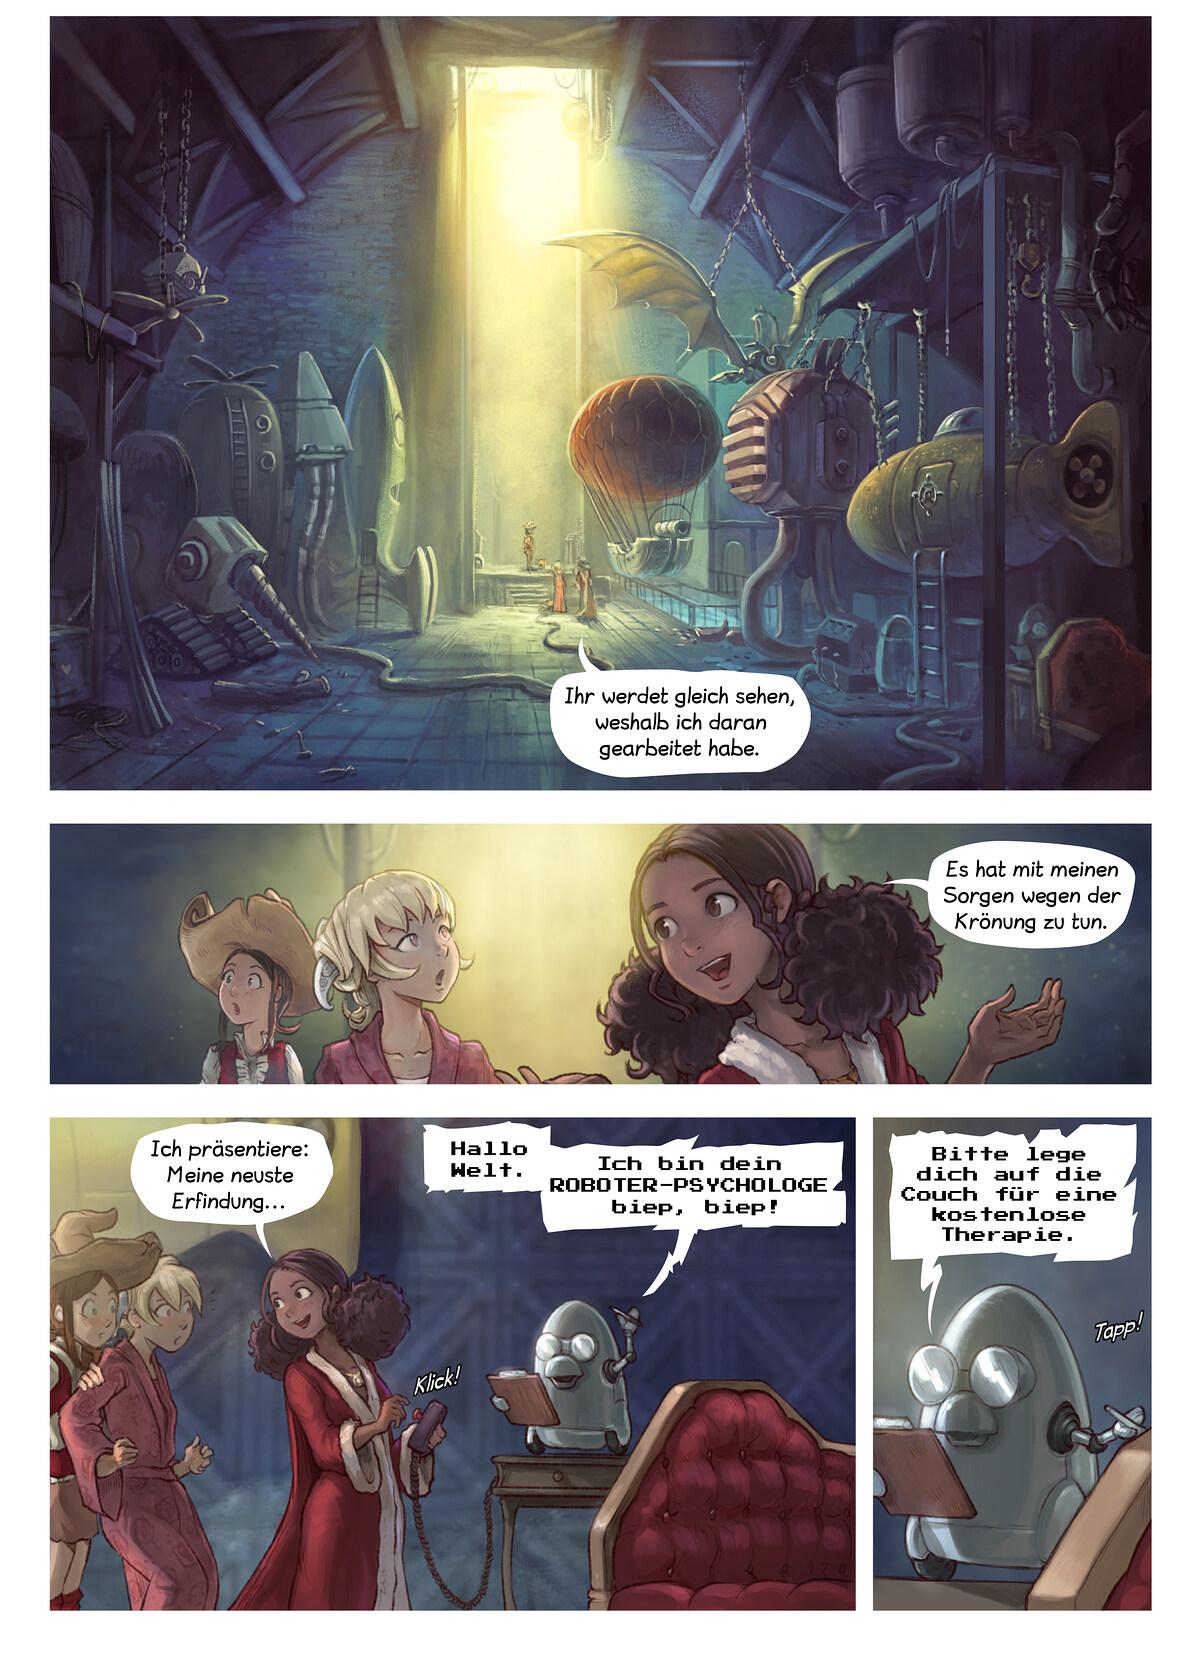 A webcomic page of Pepper&Carrot, Episode 27 [de], Seite 3